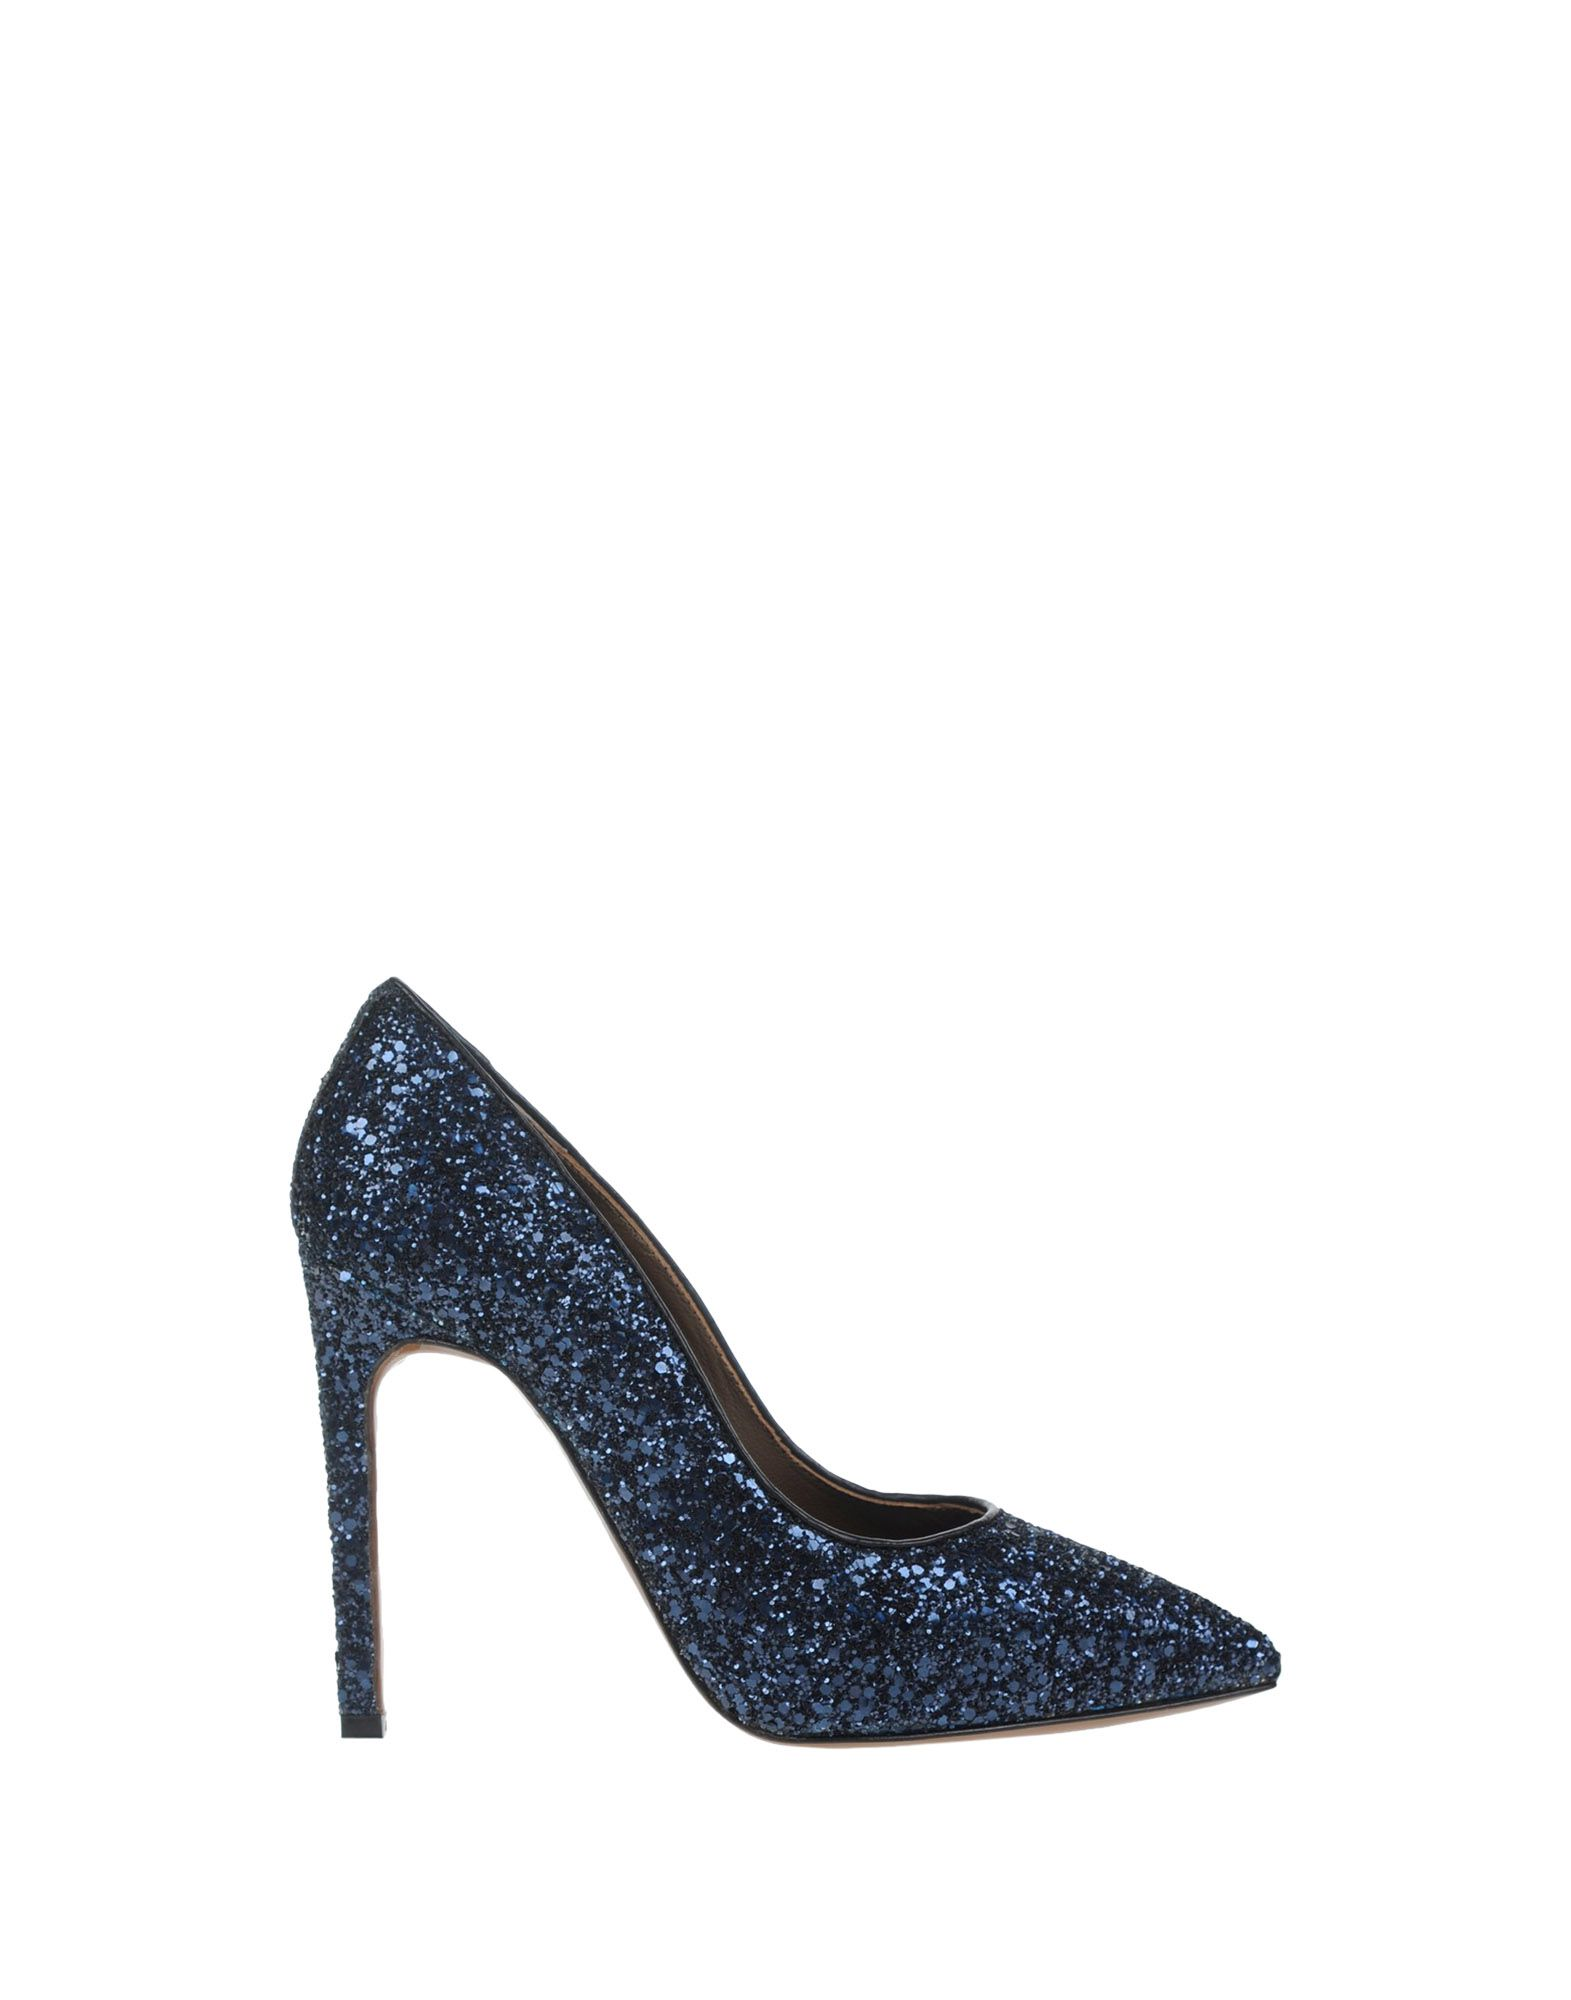 Stilvolle billige Schuhe Marni Pumps Damen  11067870IH